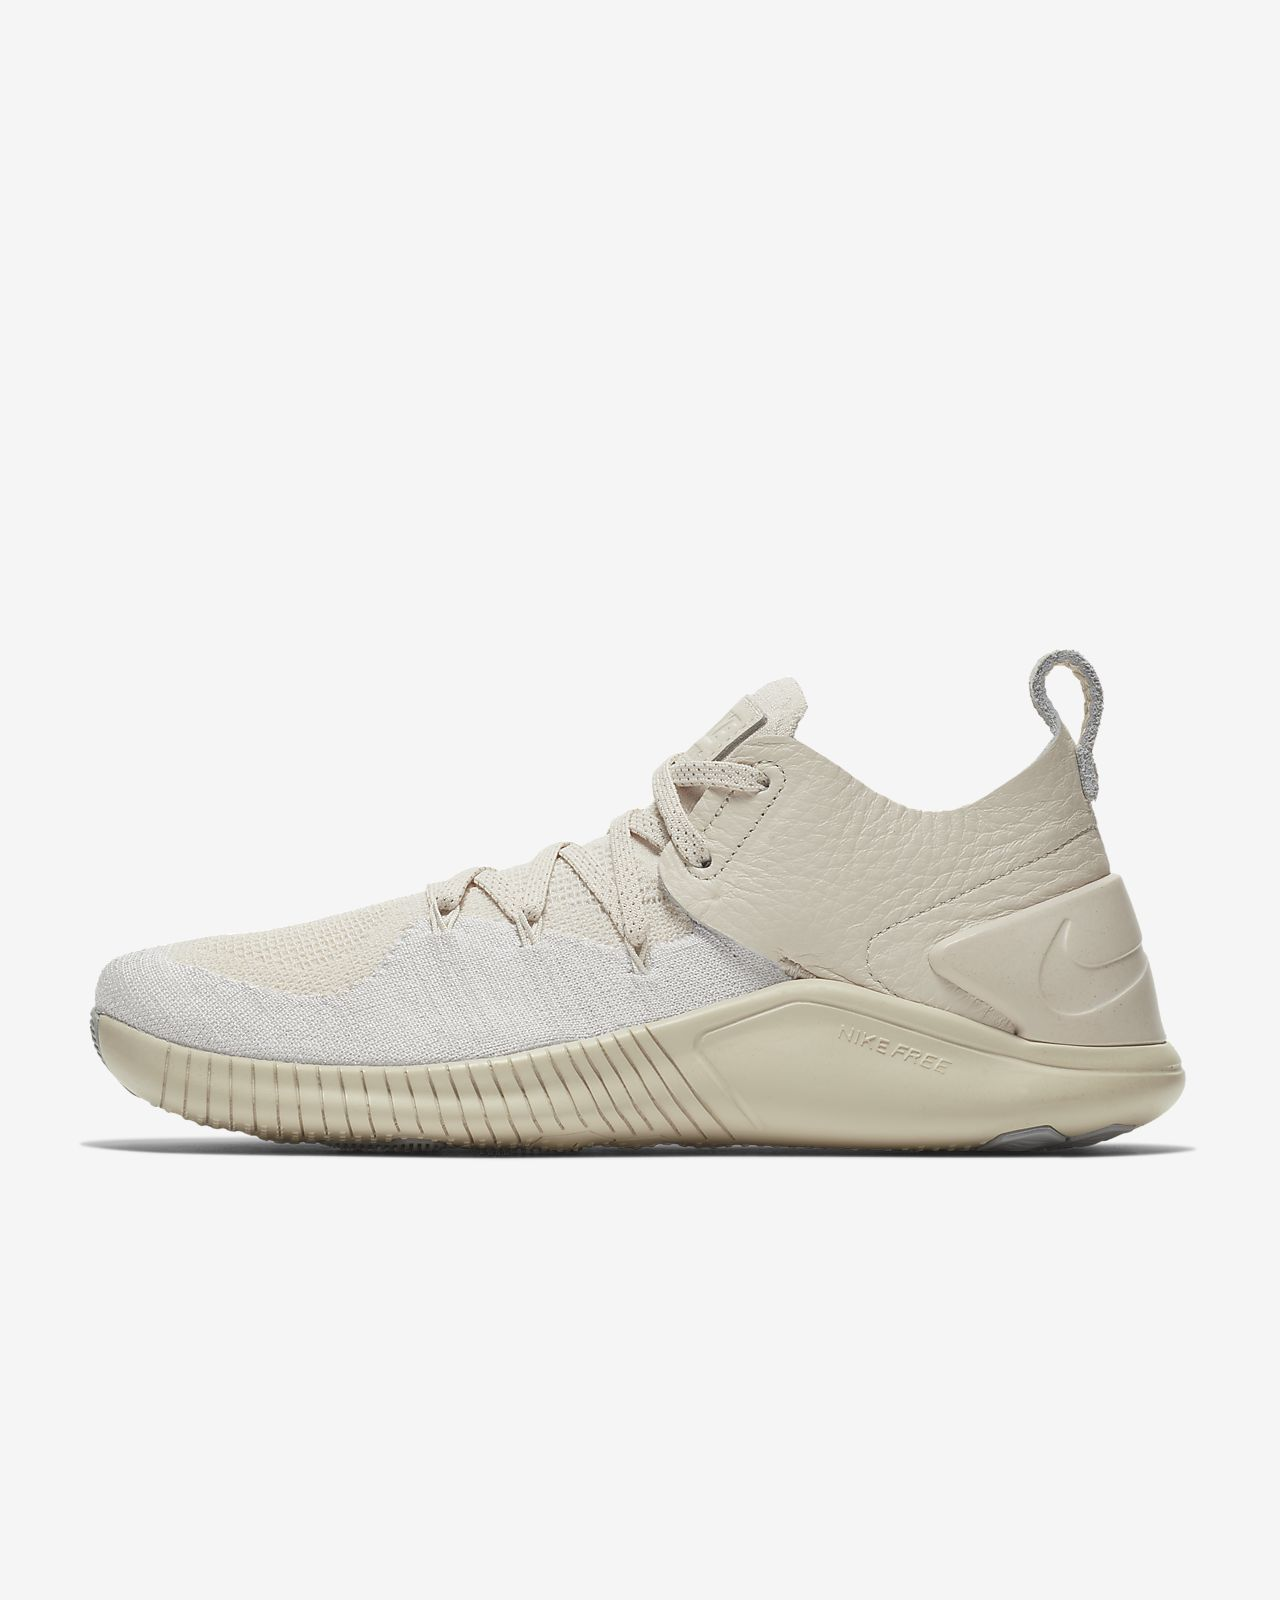 350bb29afd53 Nike Free TR Flyknit 3 Champagne Women s Training Shoe. Nike.com